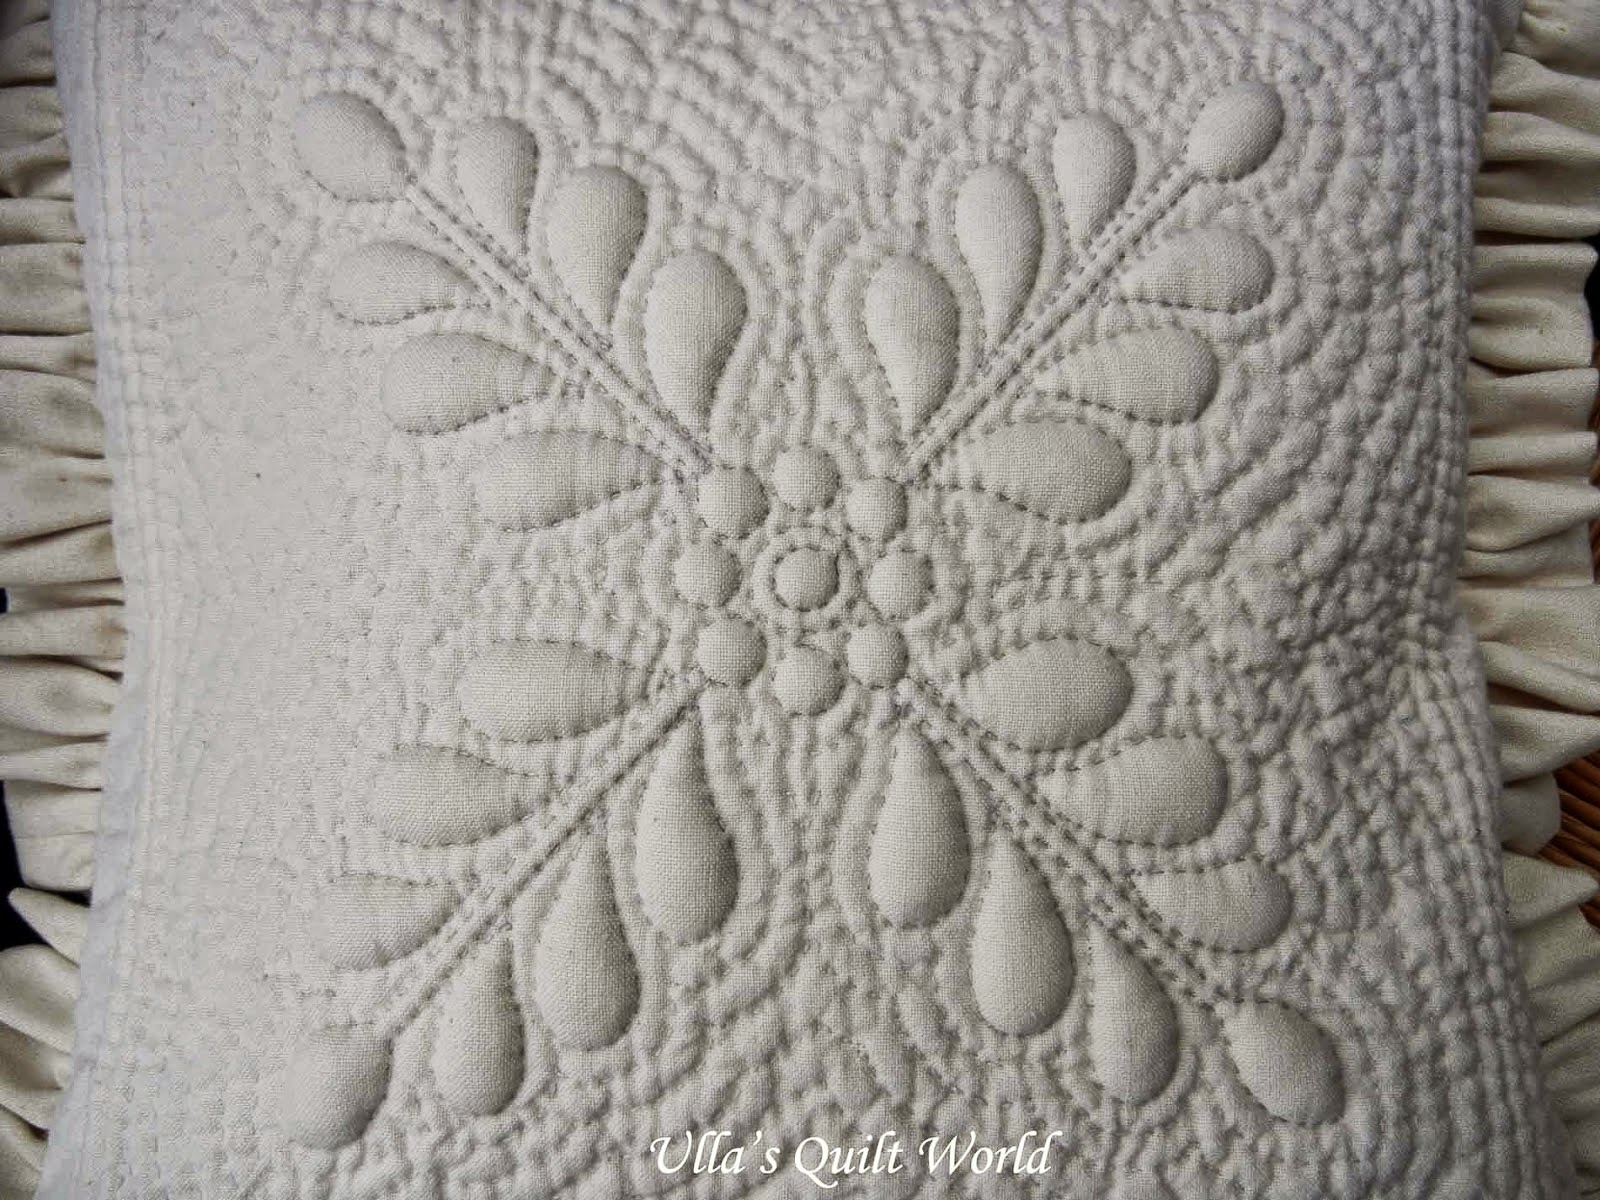 biala ozdobna poduszka pikowana